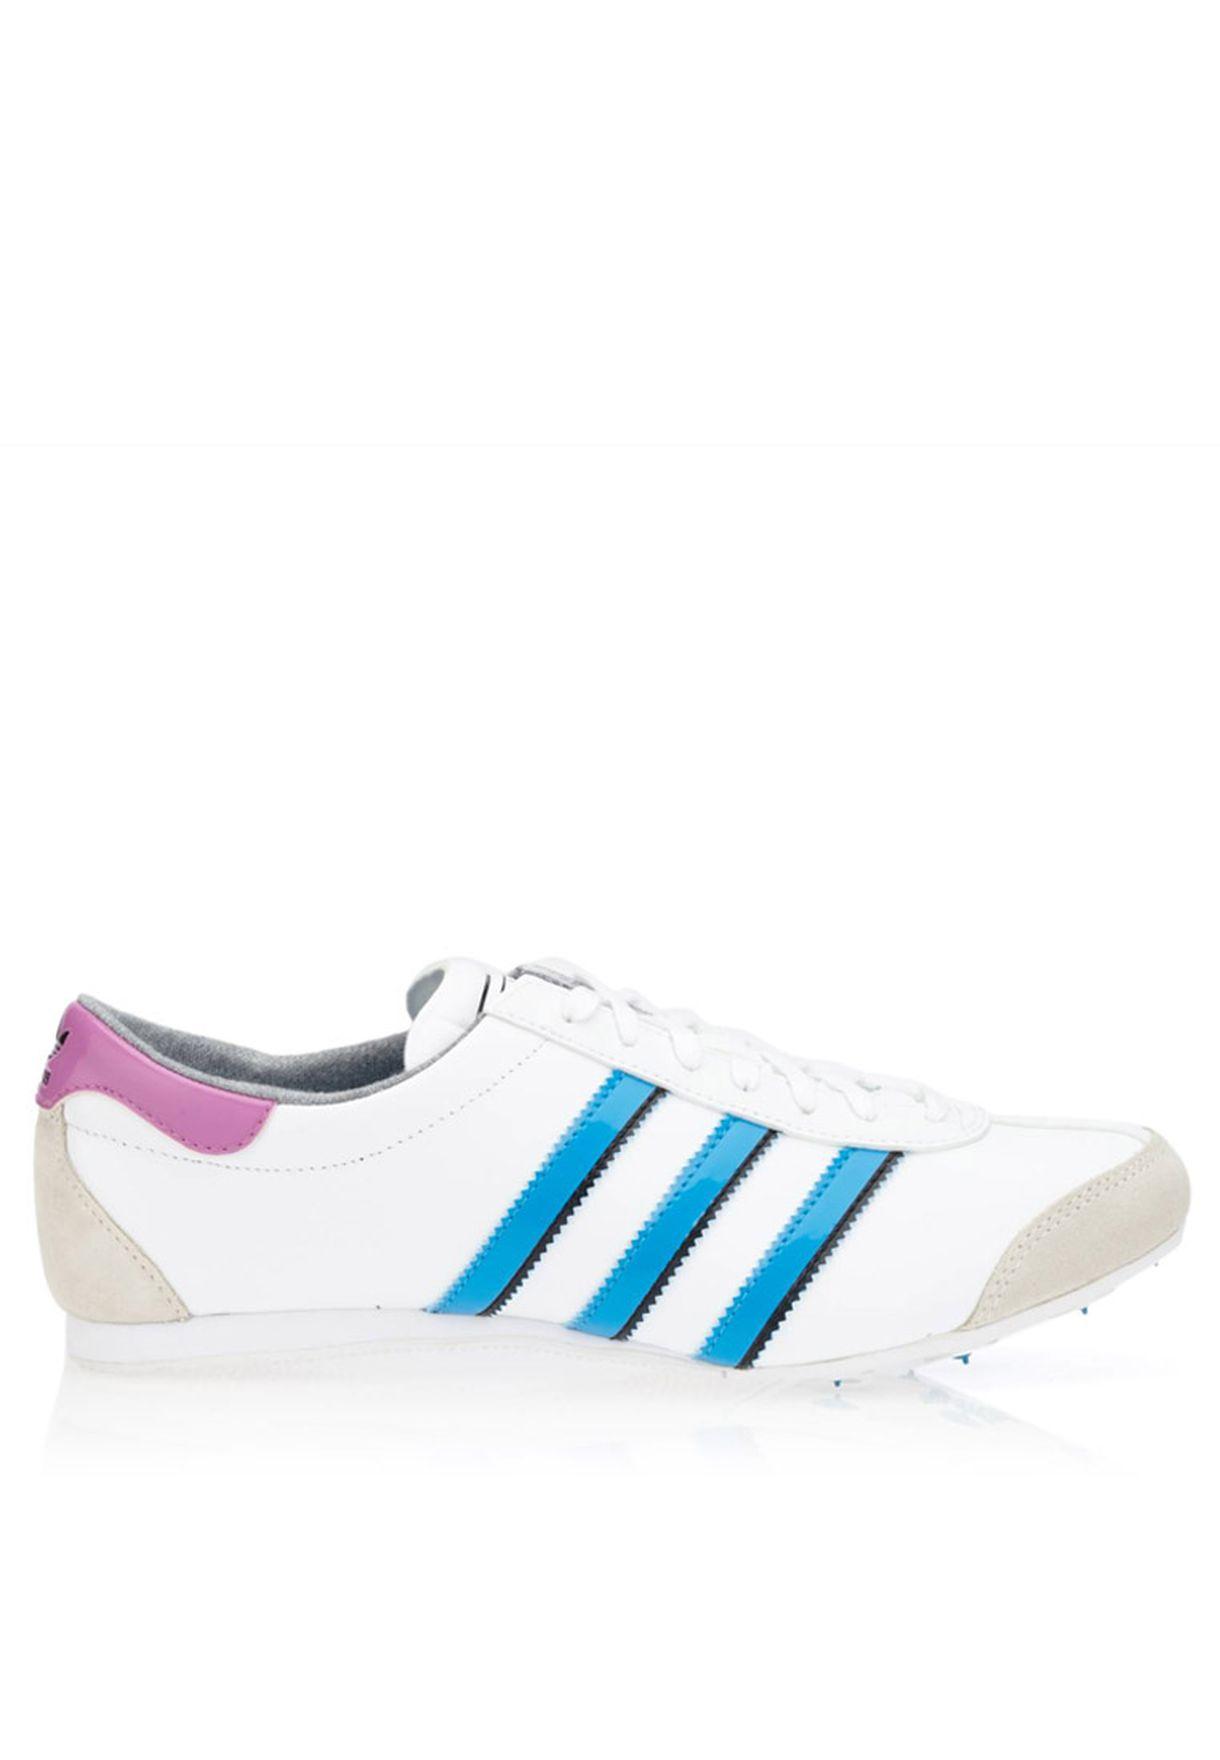 adidas Aditrack W shoes white pink